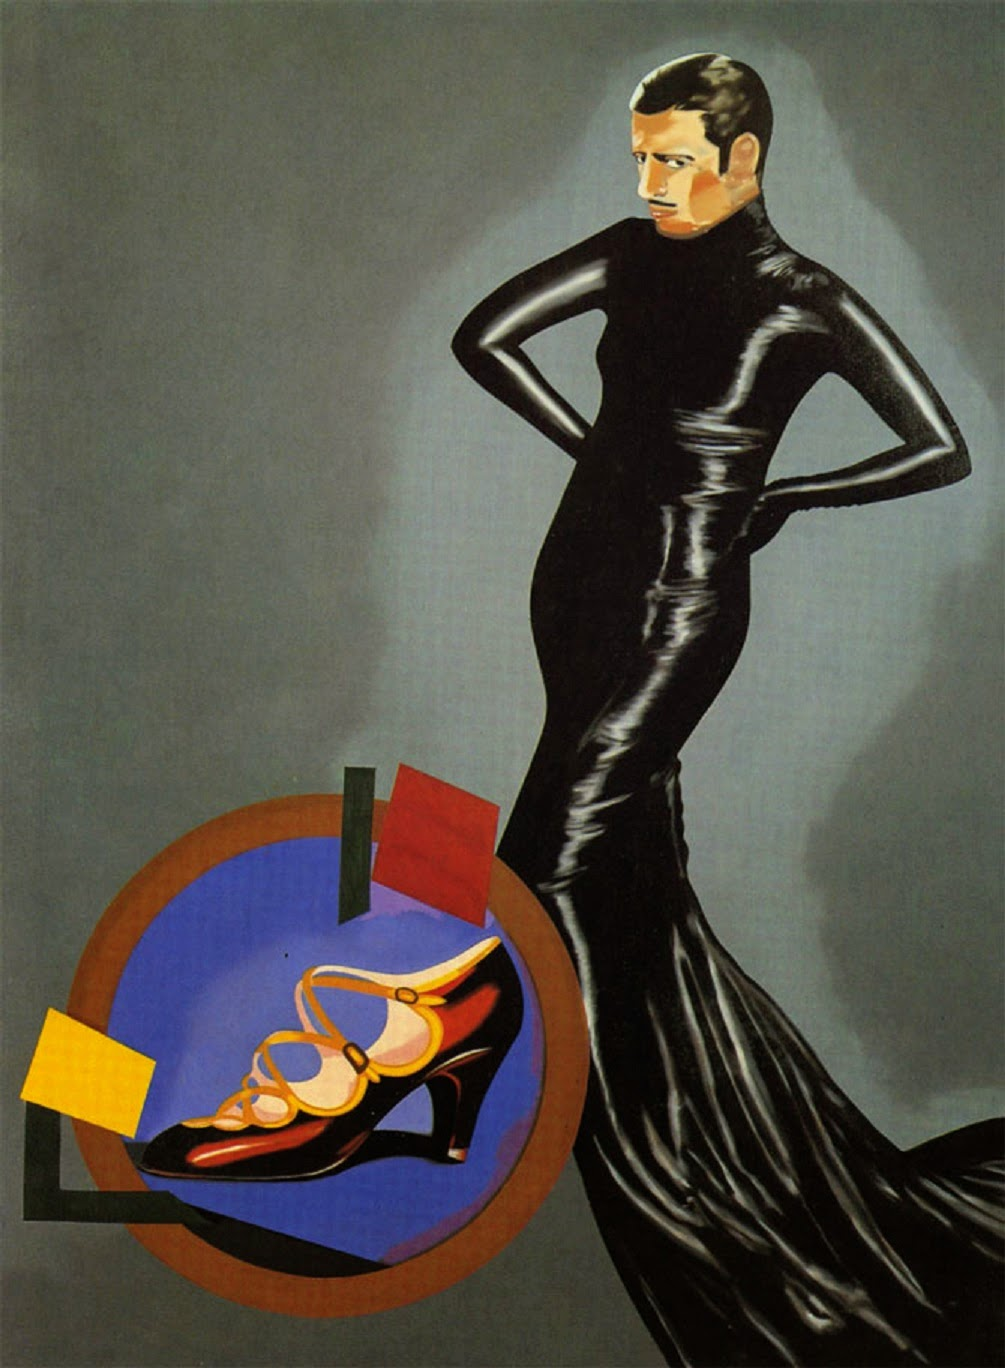 Eduardo Arroyo, 'Caballero español', 1970.